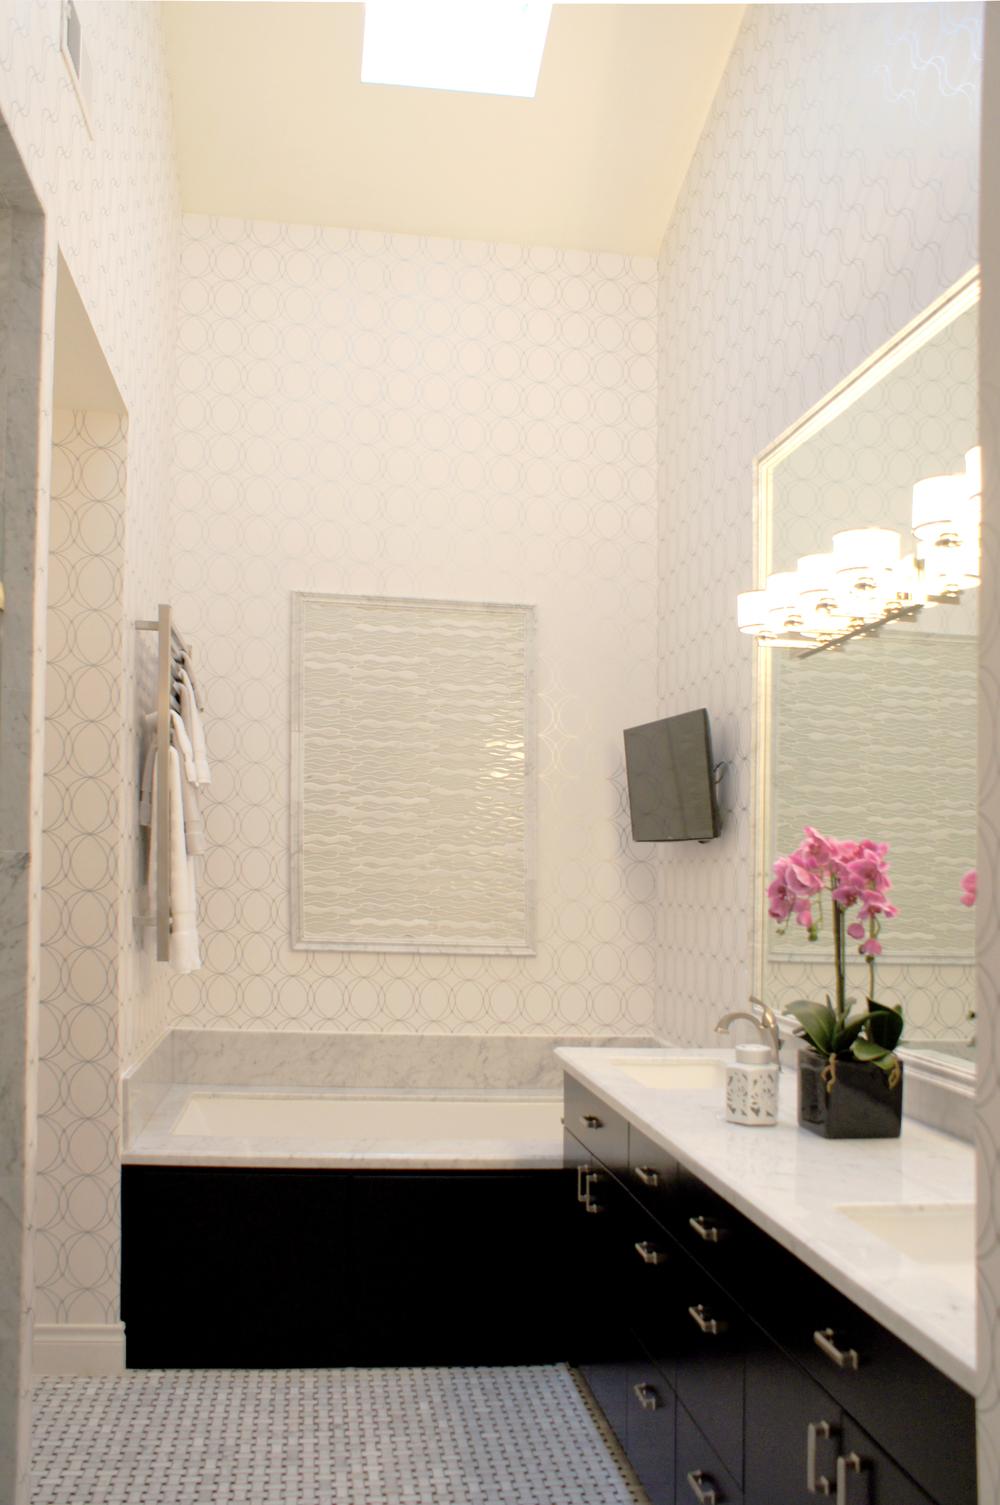 MS_bathroom_1.jpg